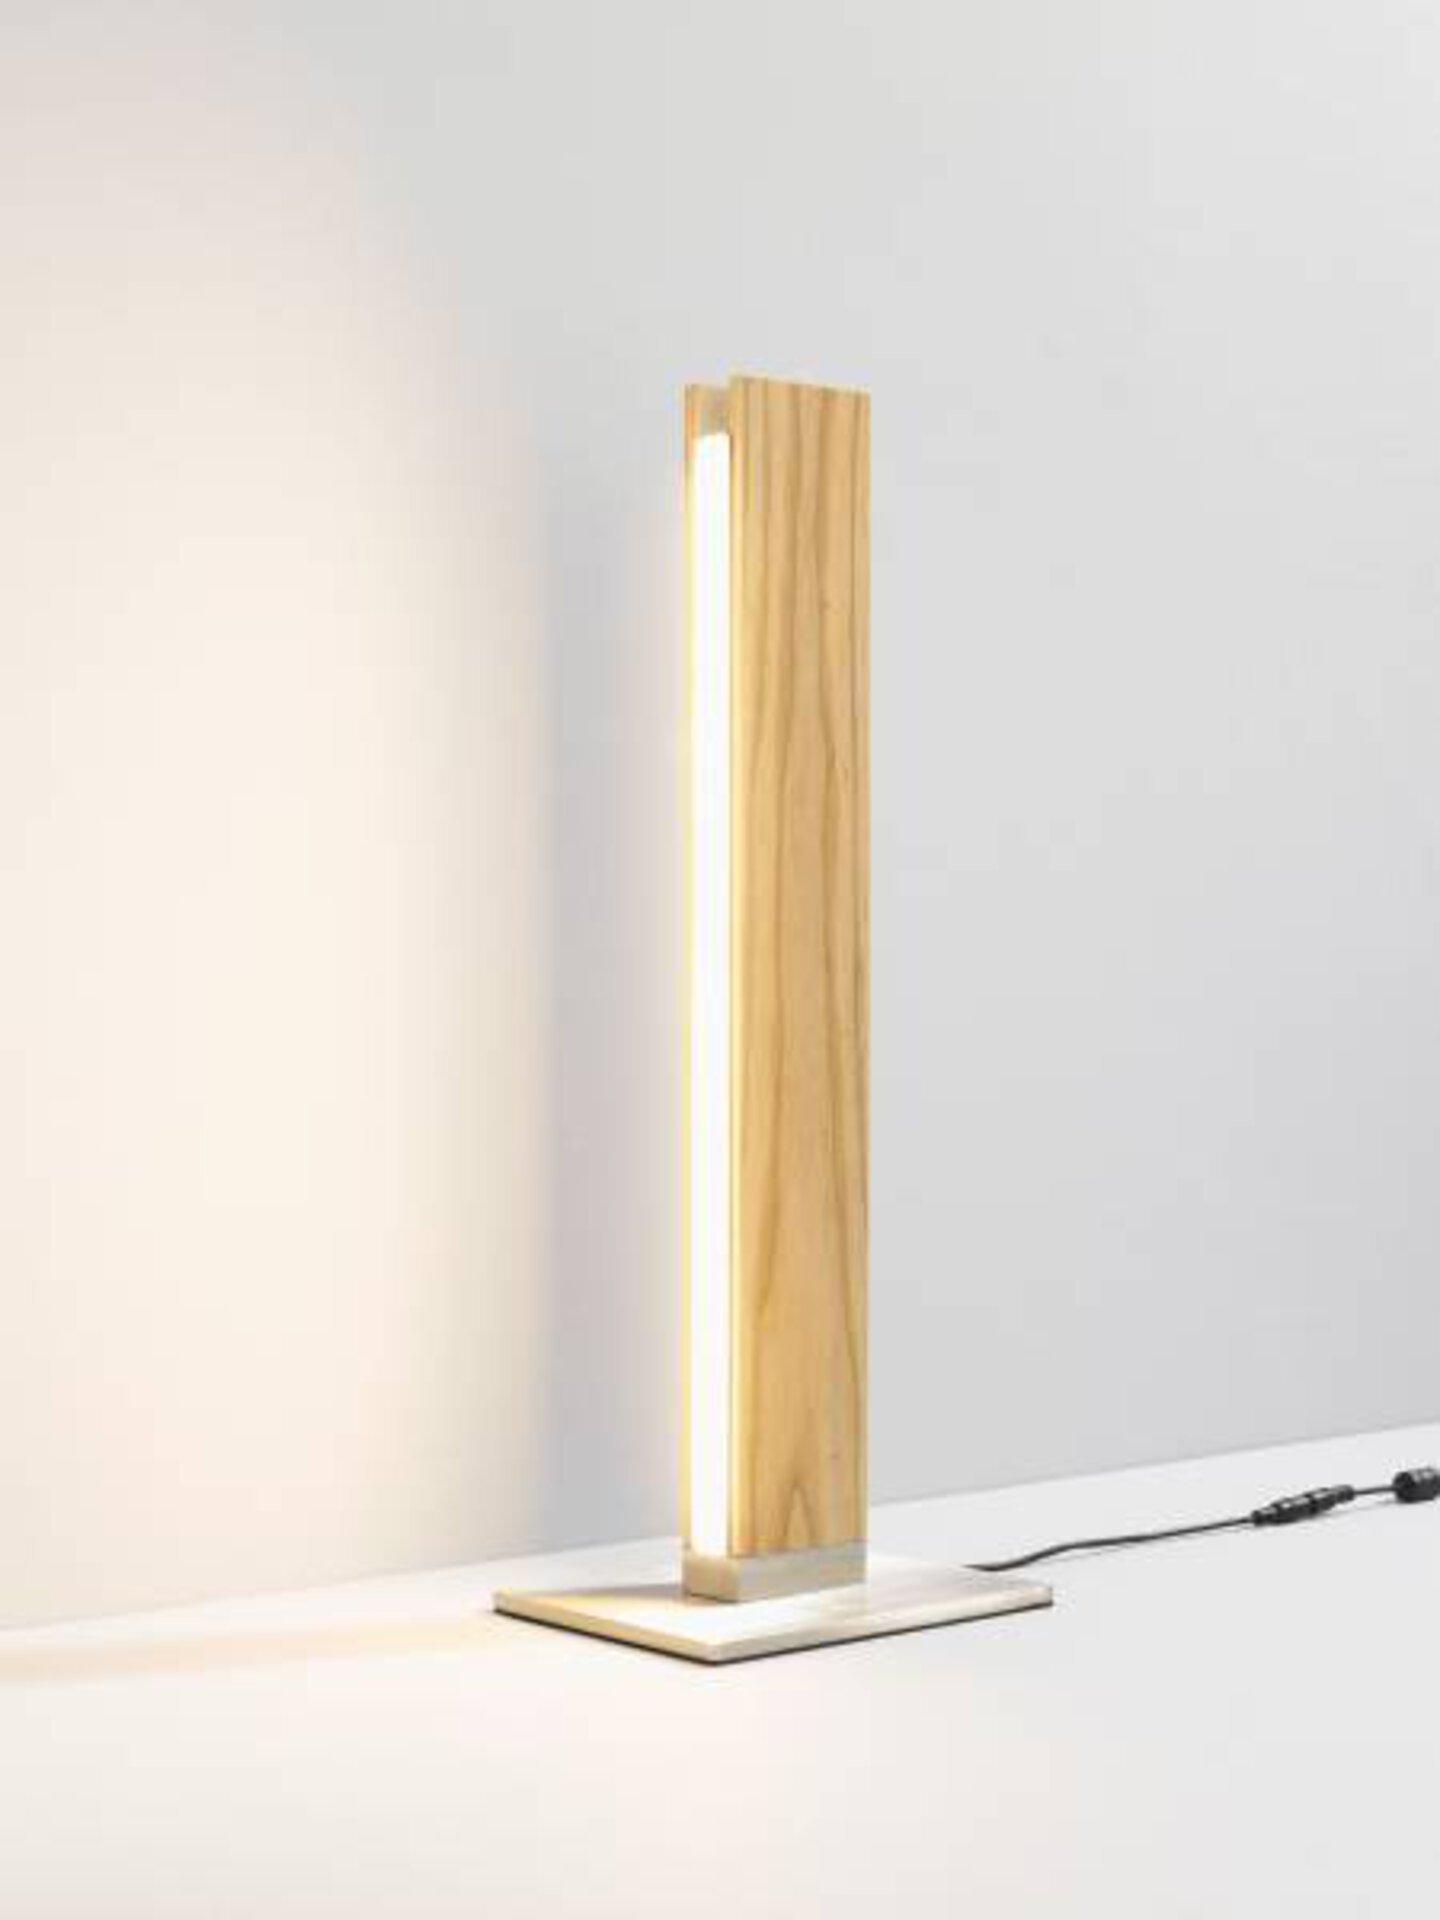 Tischleuchte Kimo Casa Nova Metall 20 x 53 x 15 cm